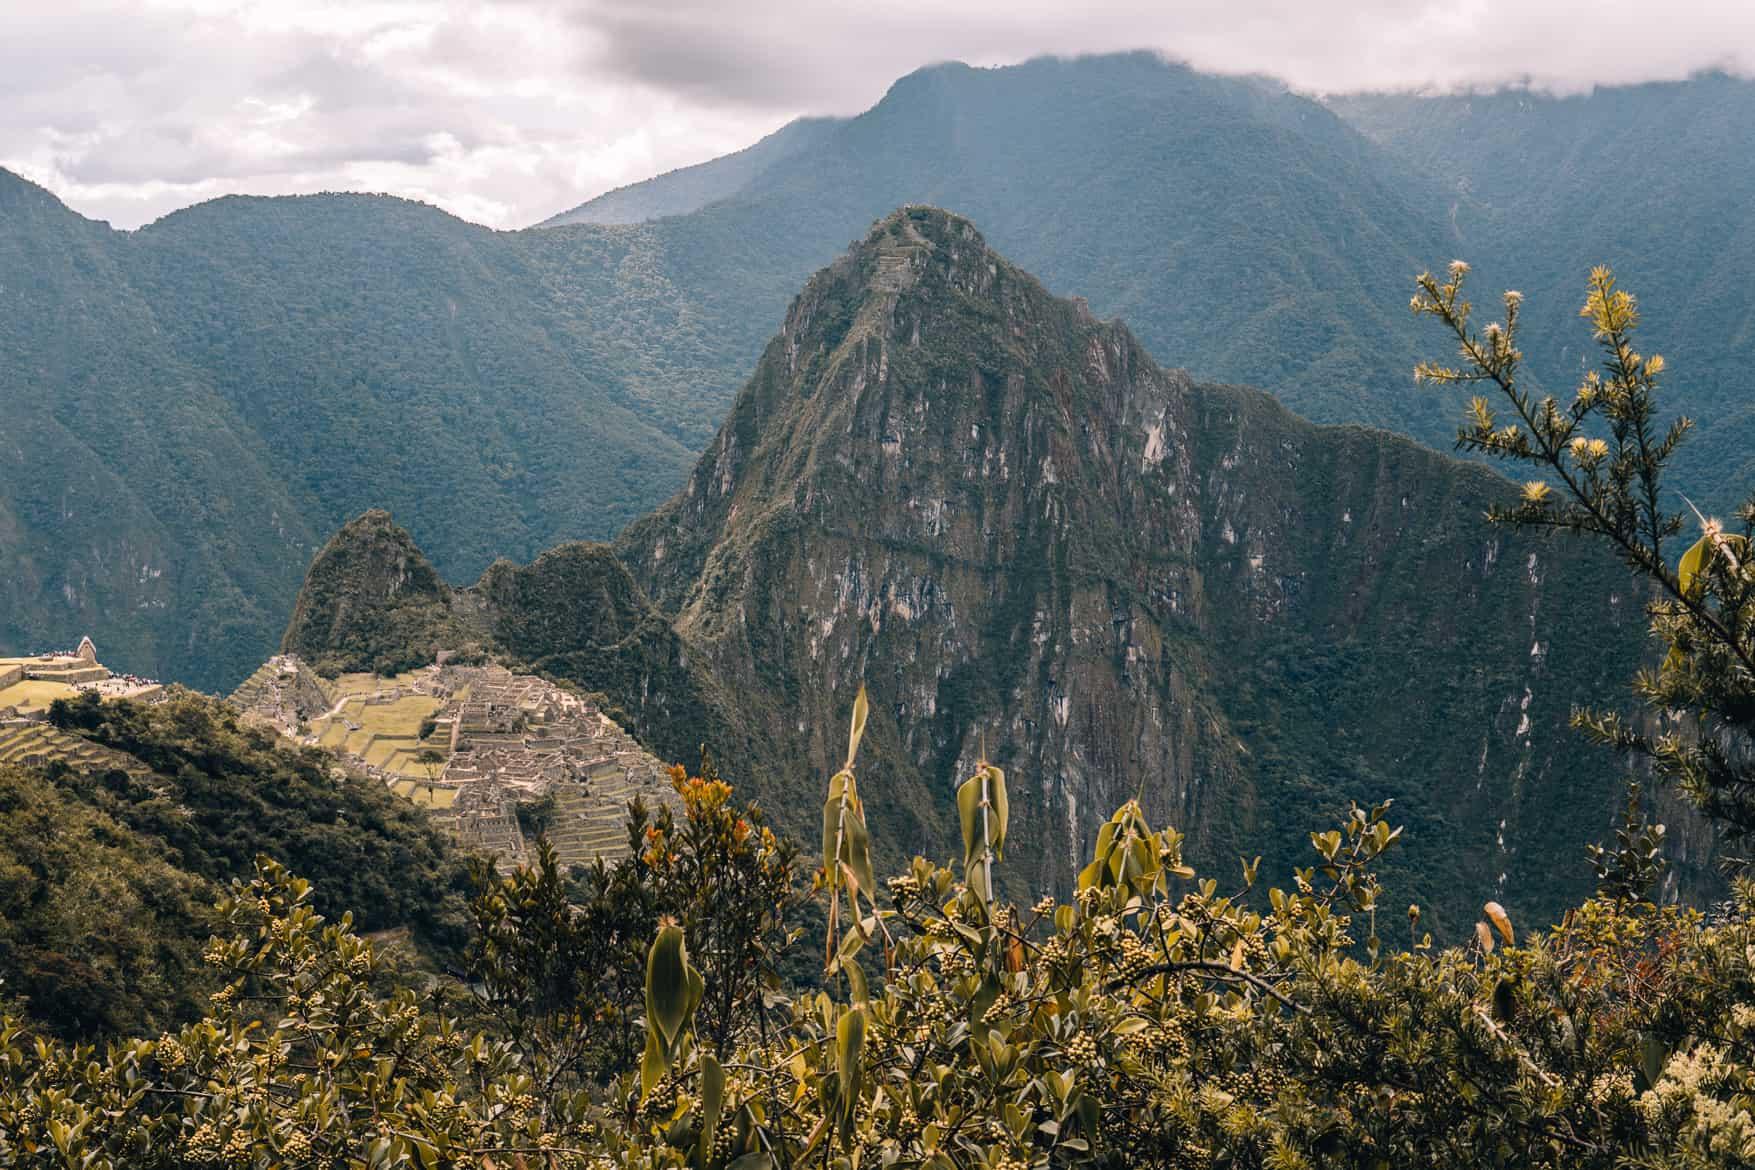 Machz Picchu Guide - Sun gate = Sonnentor